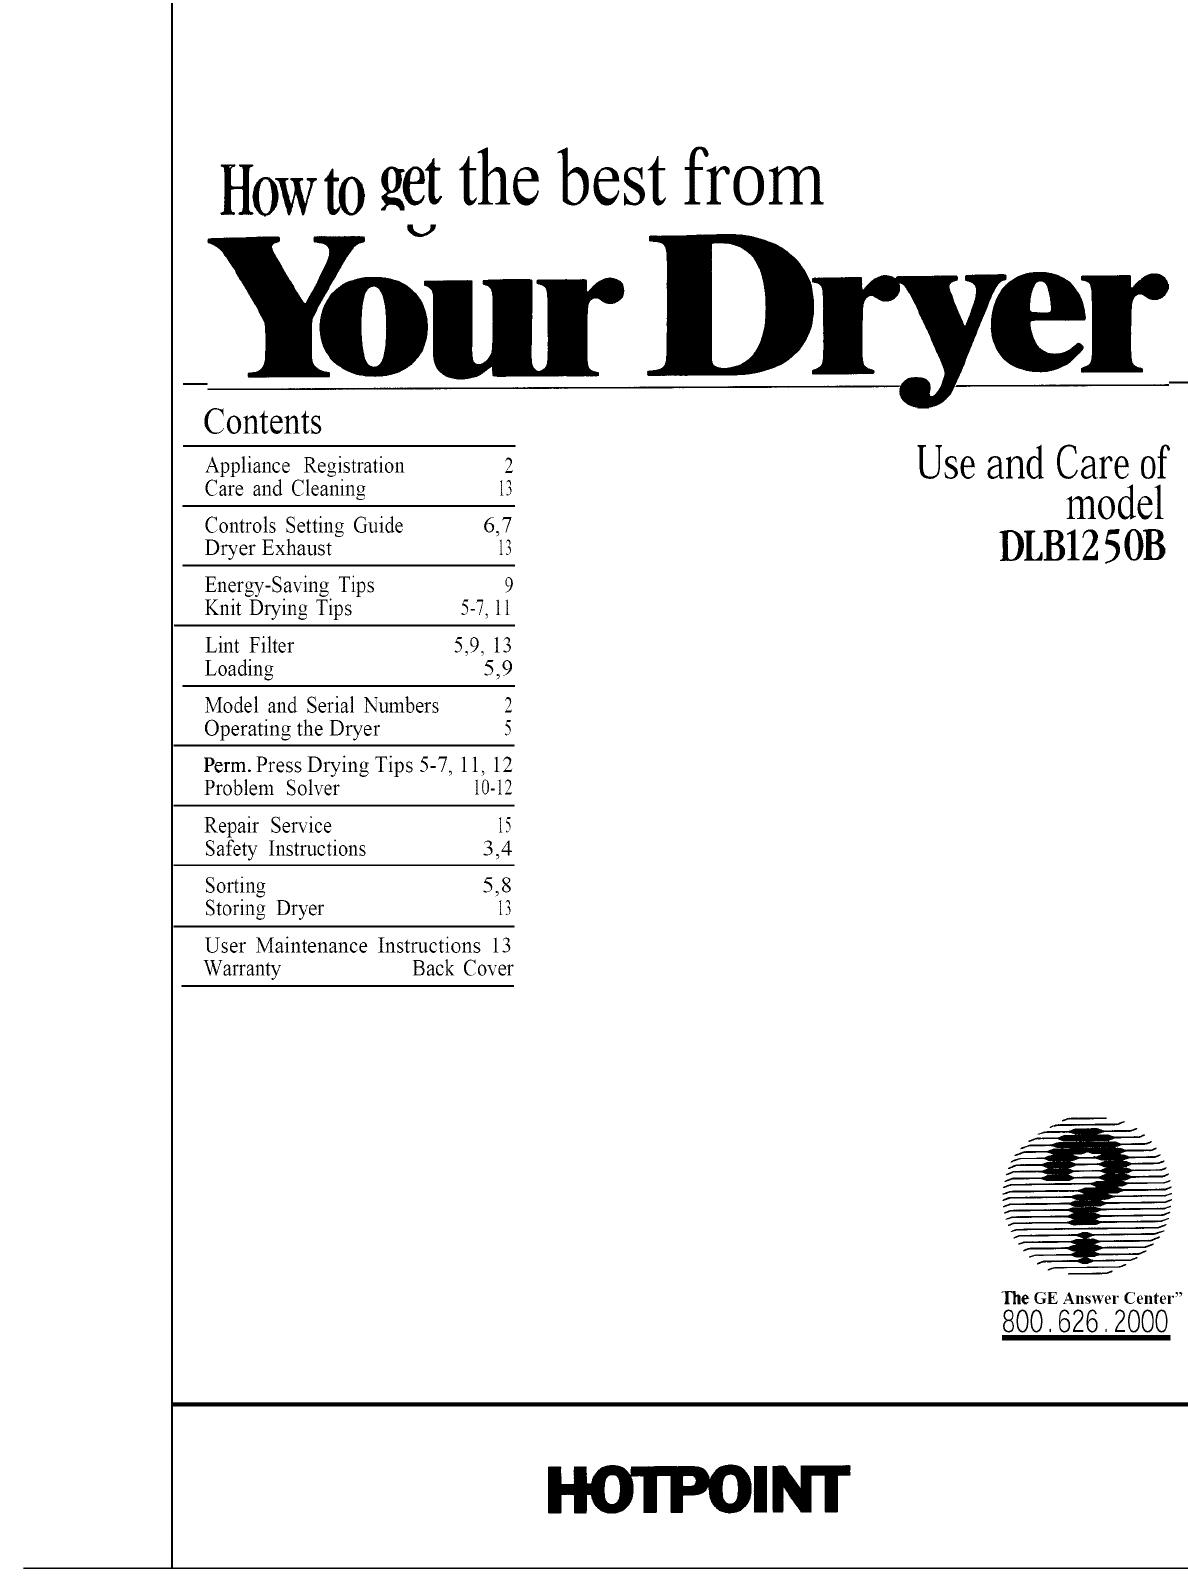 Hotpoint-creda ct33v (crusader) tumble dryer download instruction.